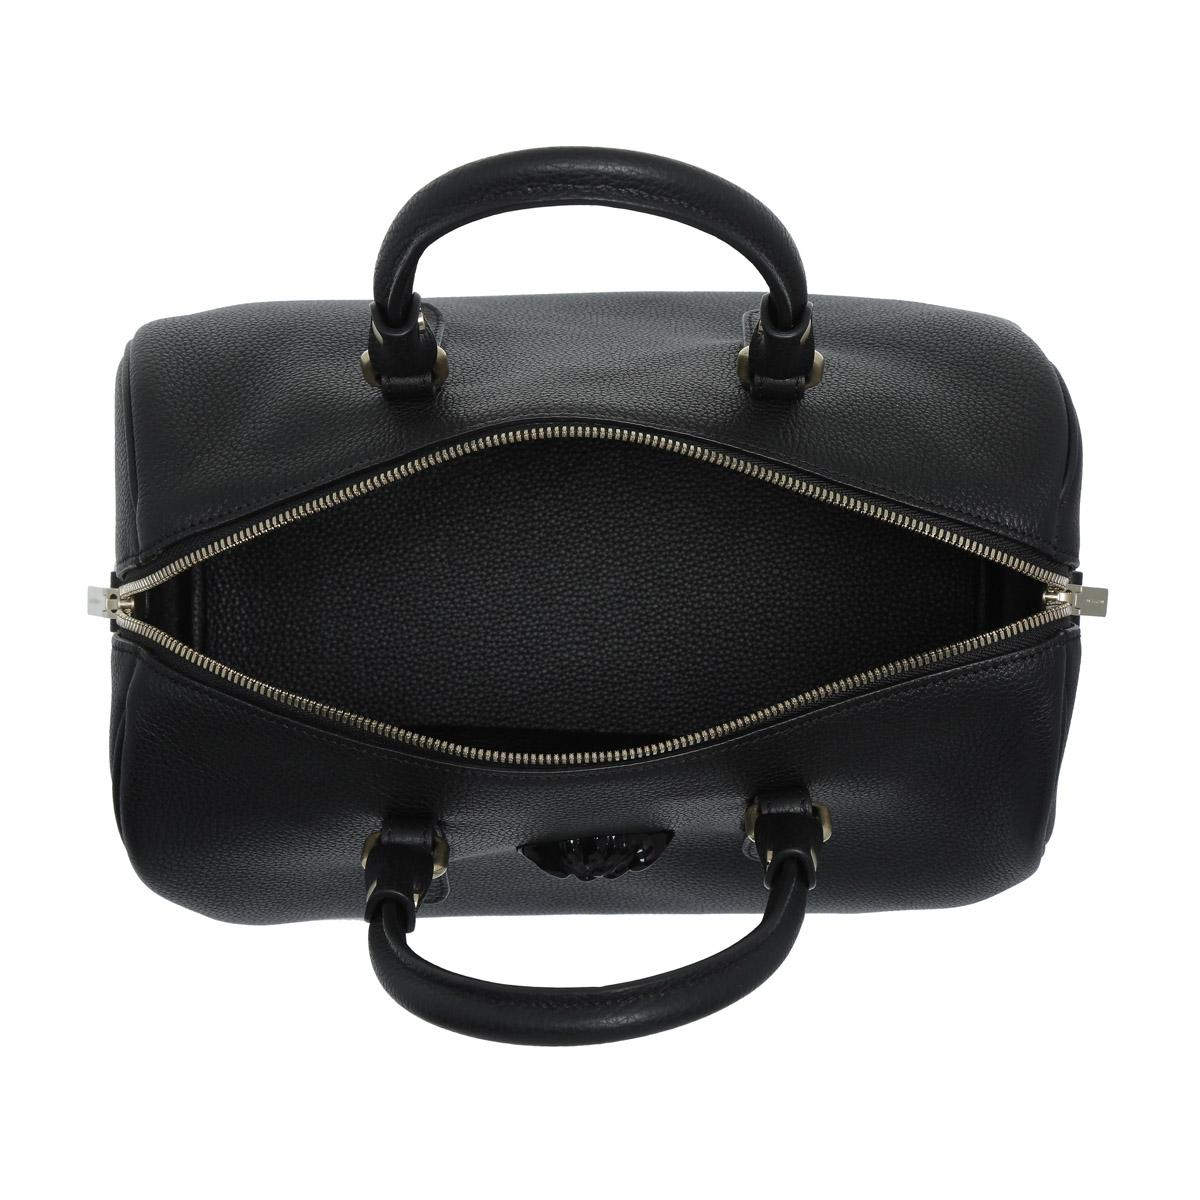 cb1511d6a408 Versace Medusa Bowling Bag Black in Black - Lyst